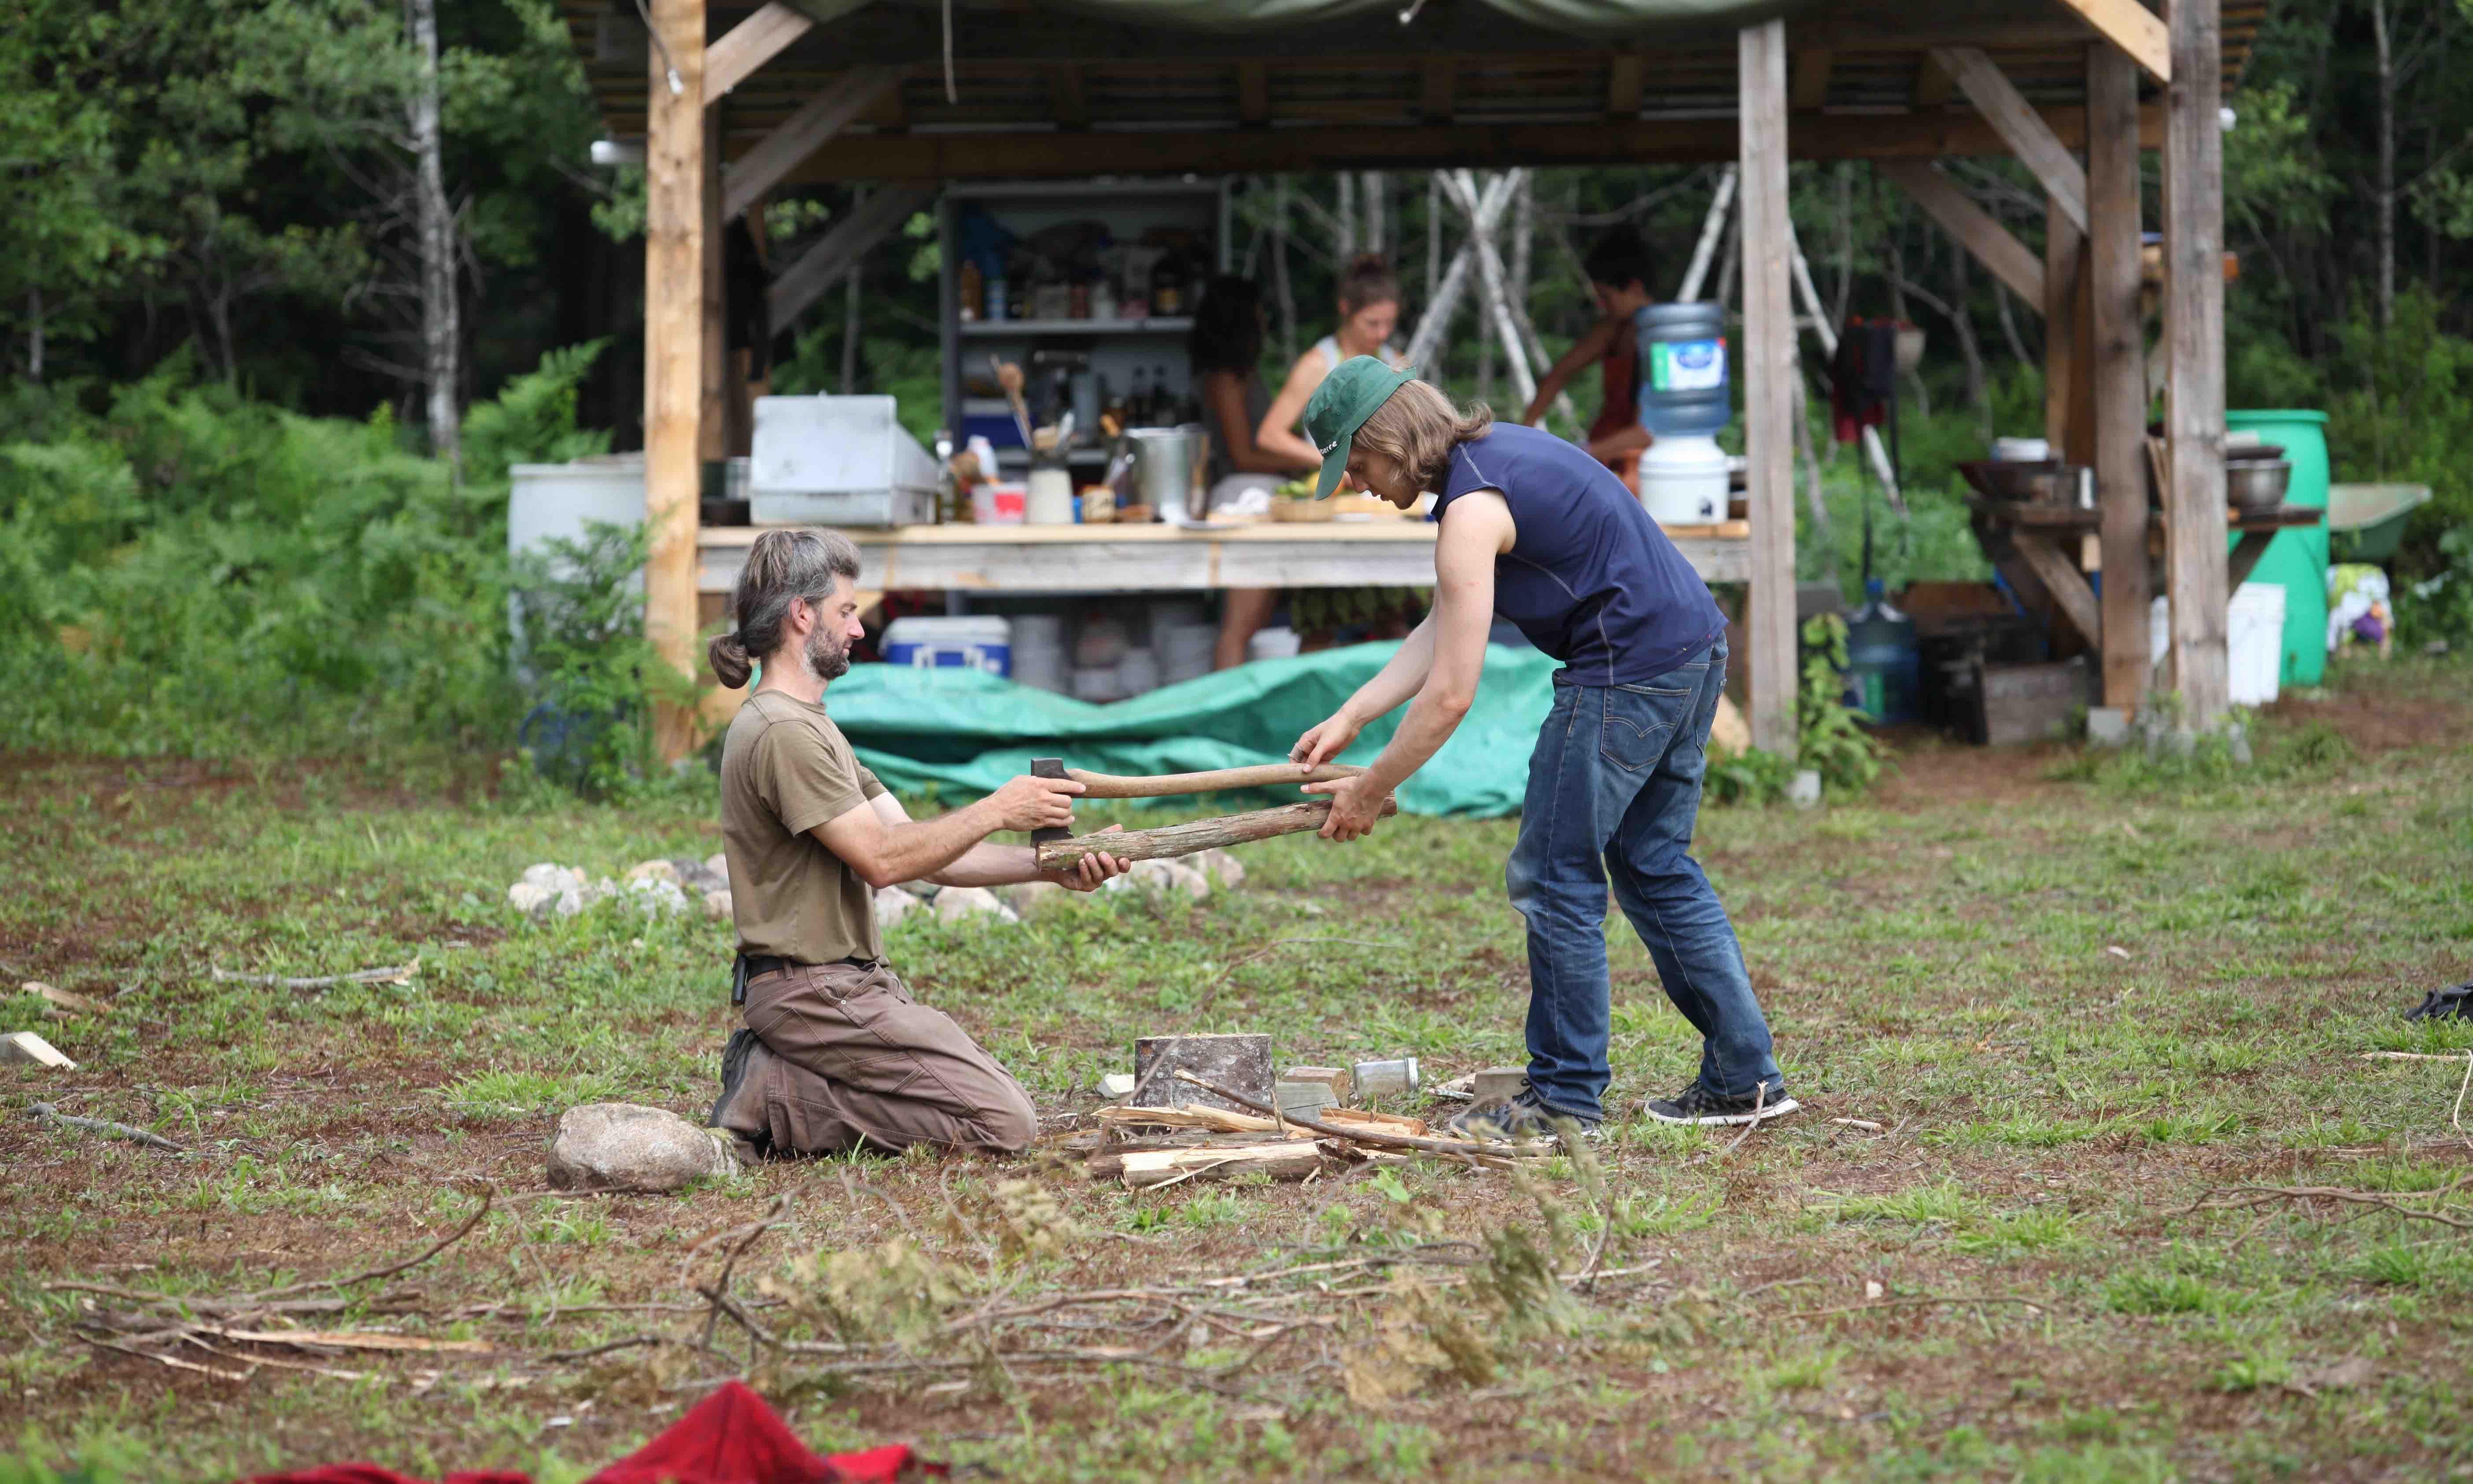 Slicing wood teaching